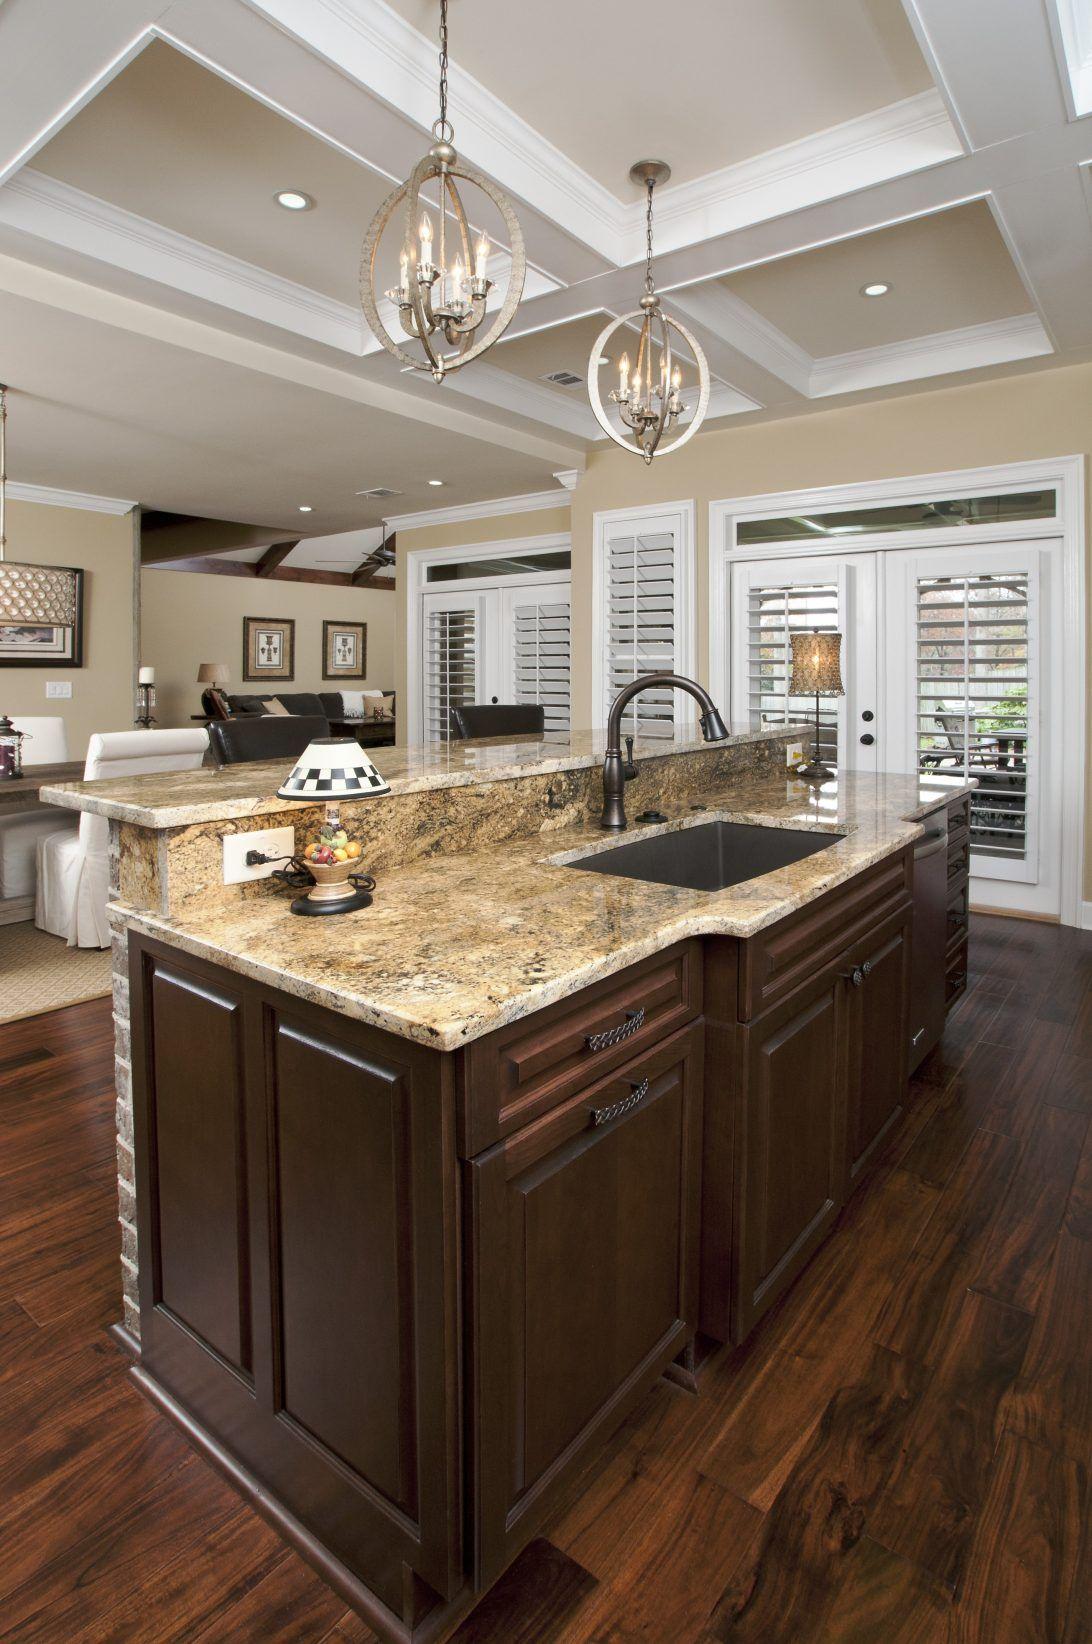 most peerless kitchen lighting ideas over island inspirational